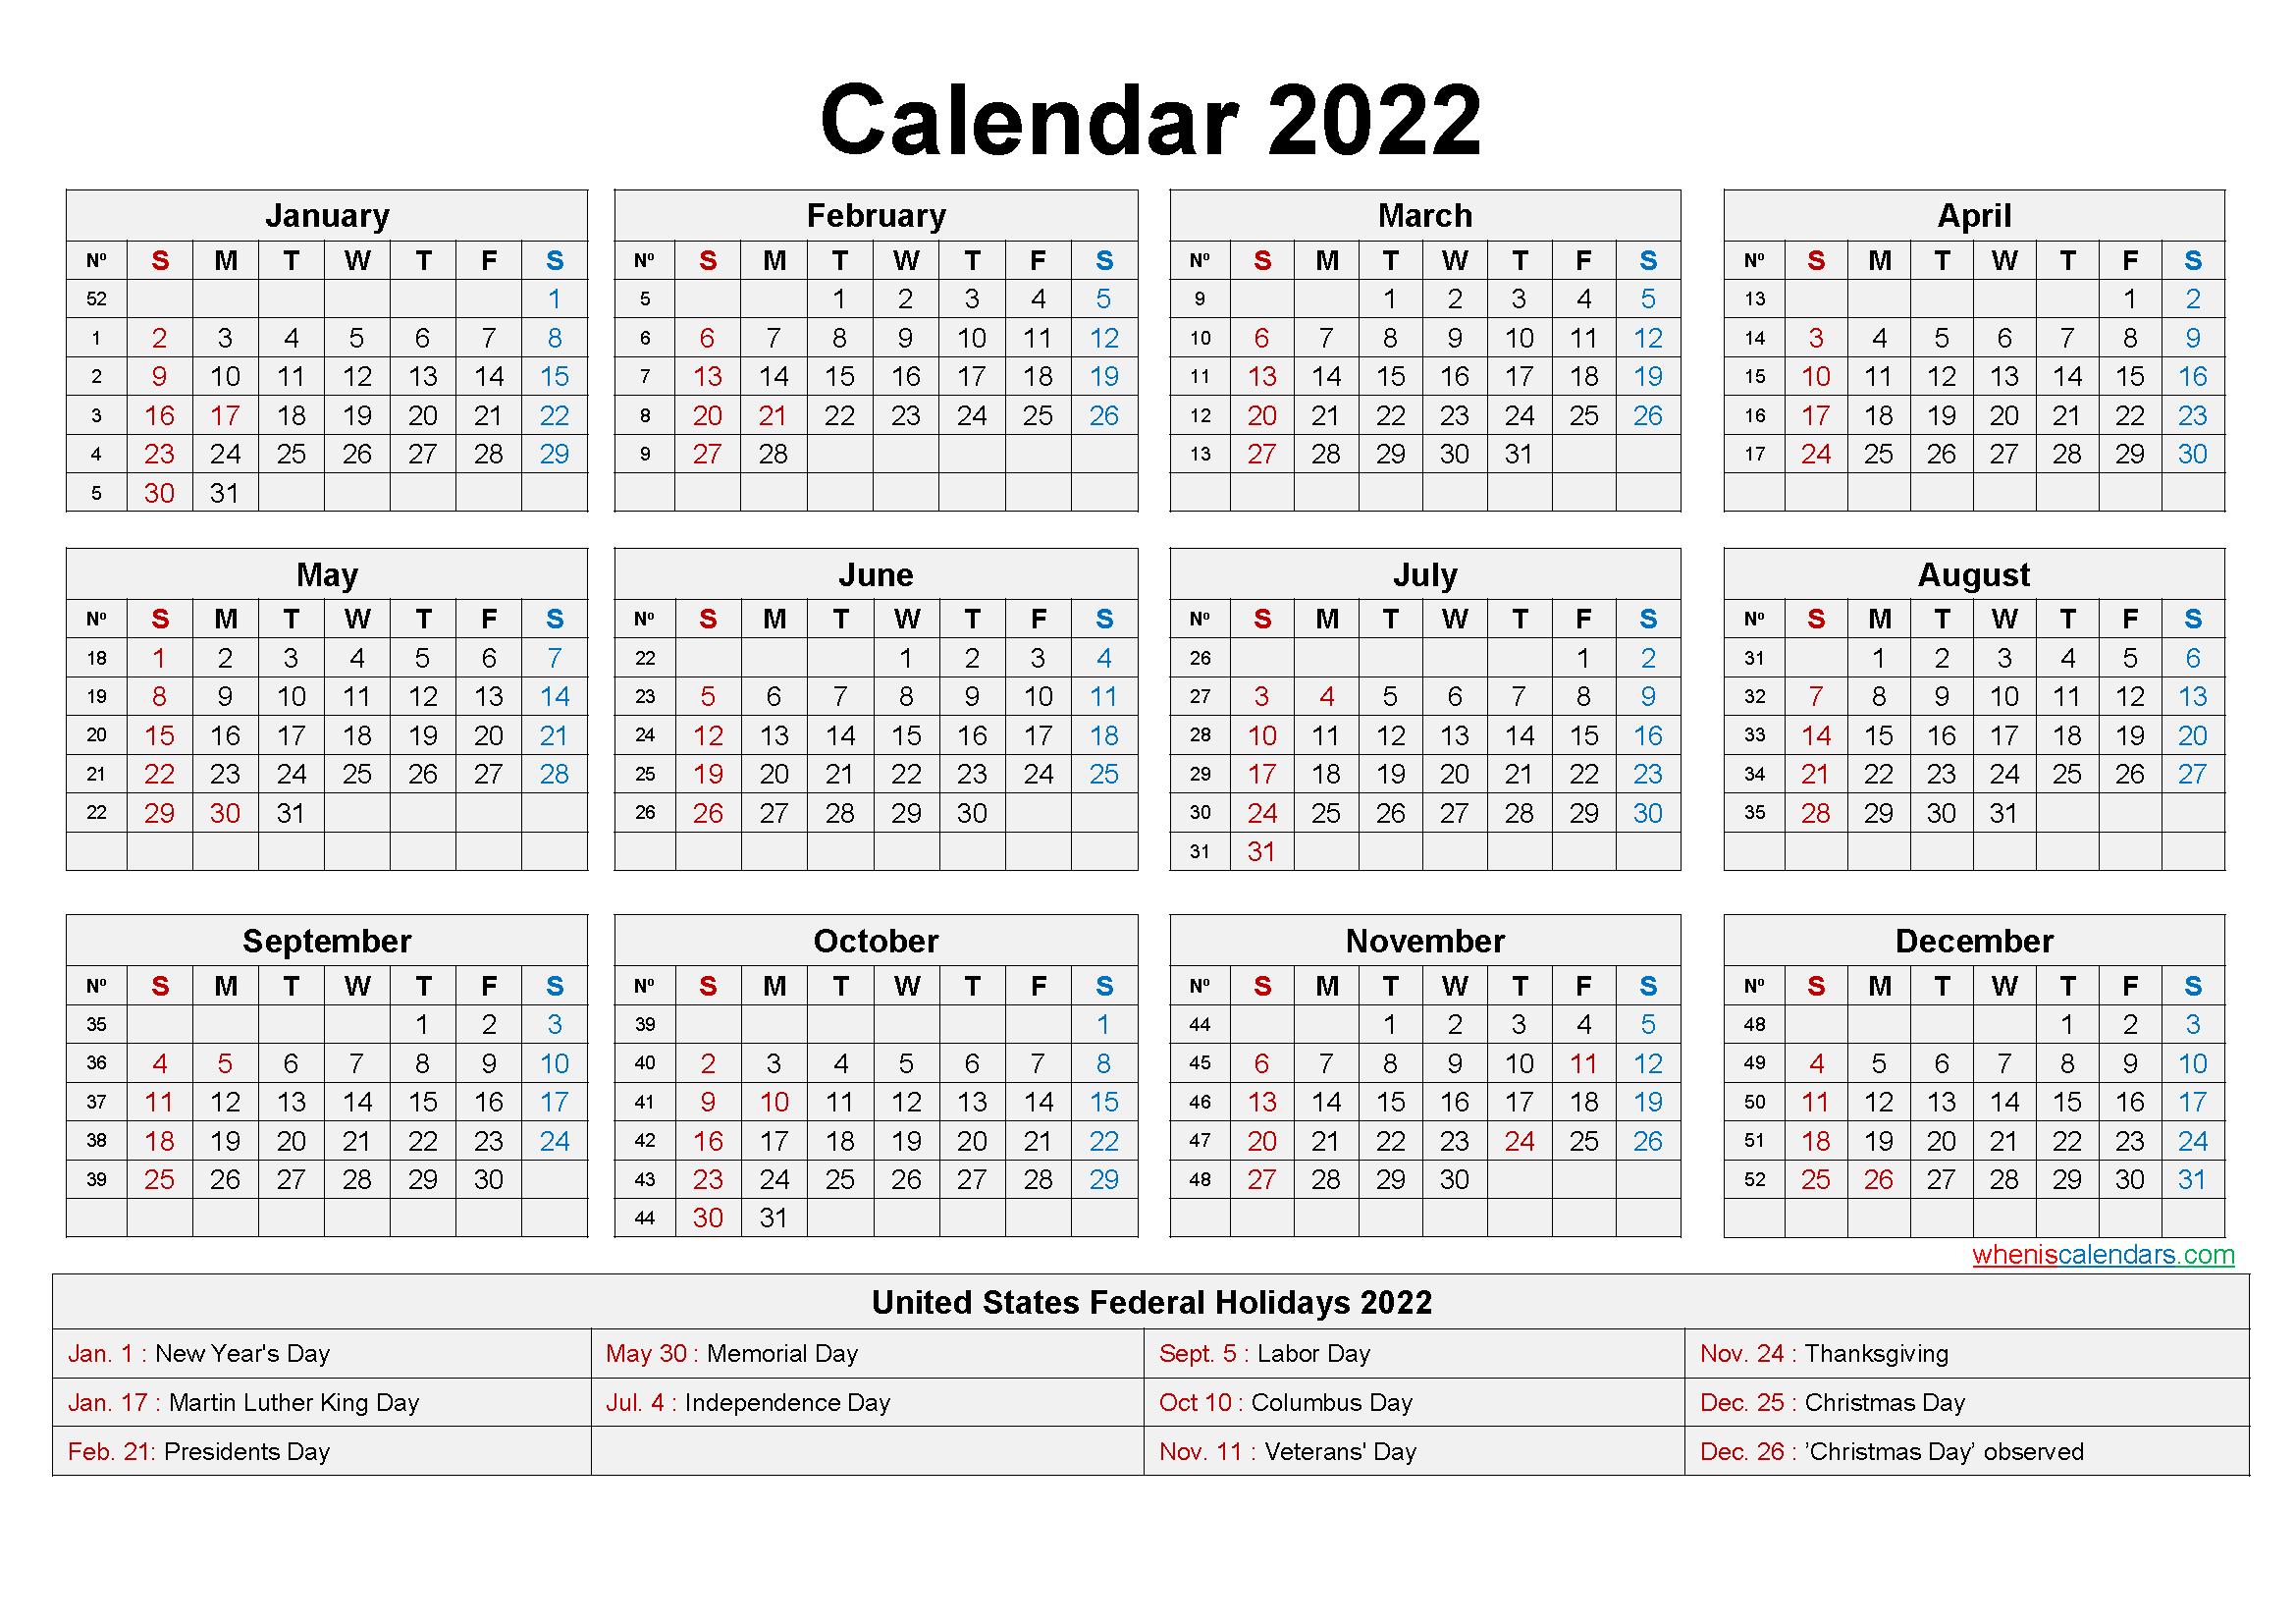 Large Desk Calendar 2022 With Holidays